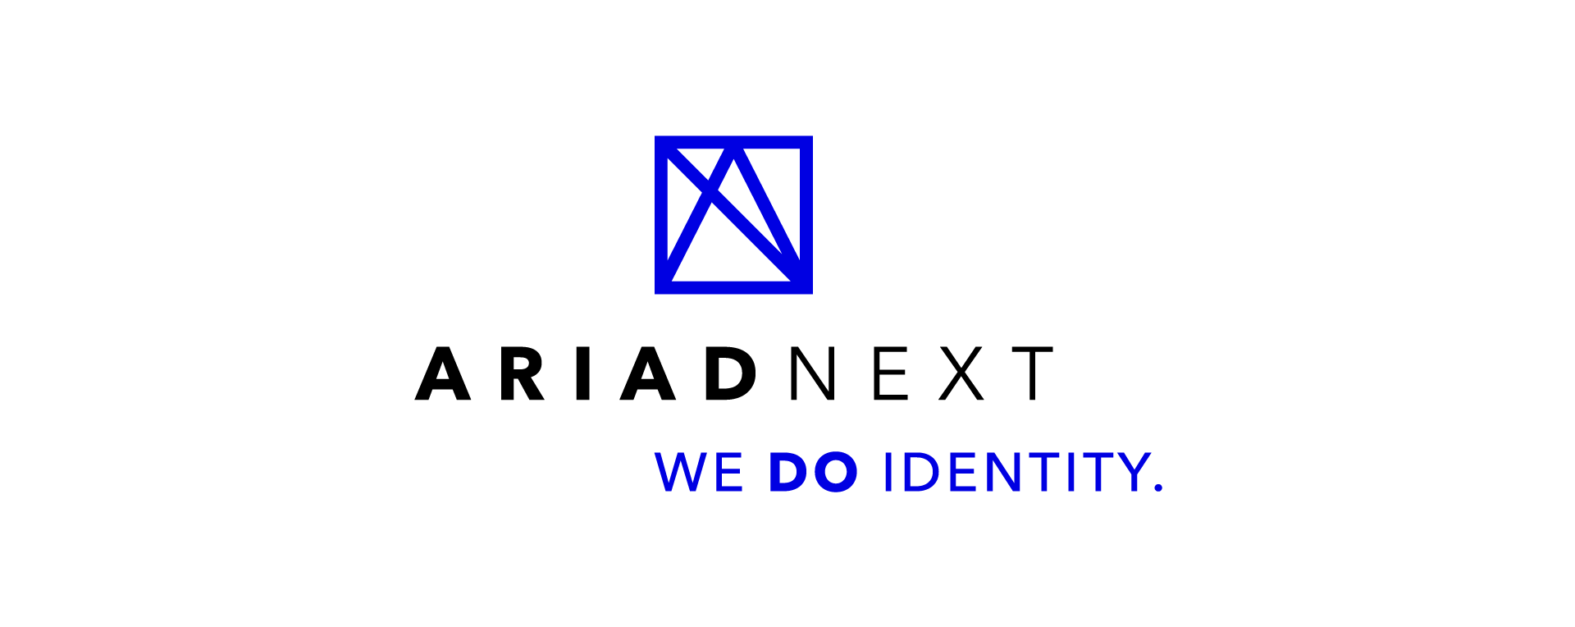 Landeau création Ariadnext logo